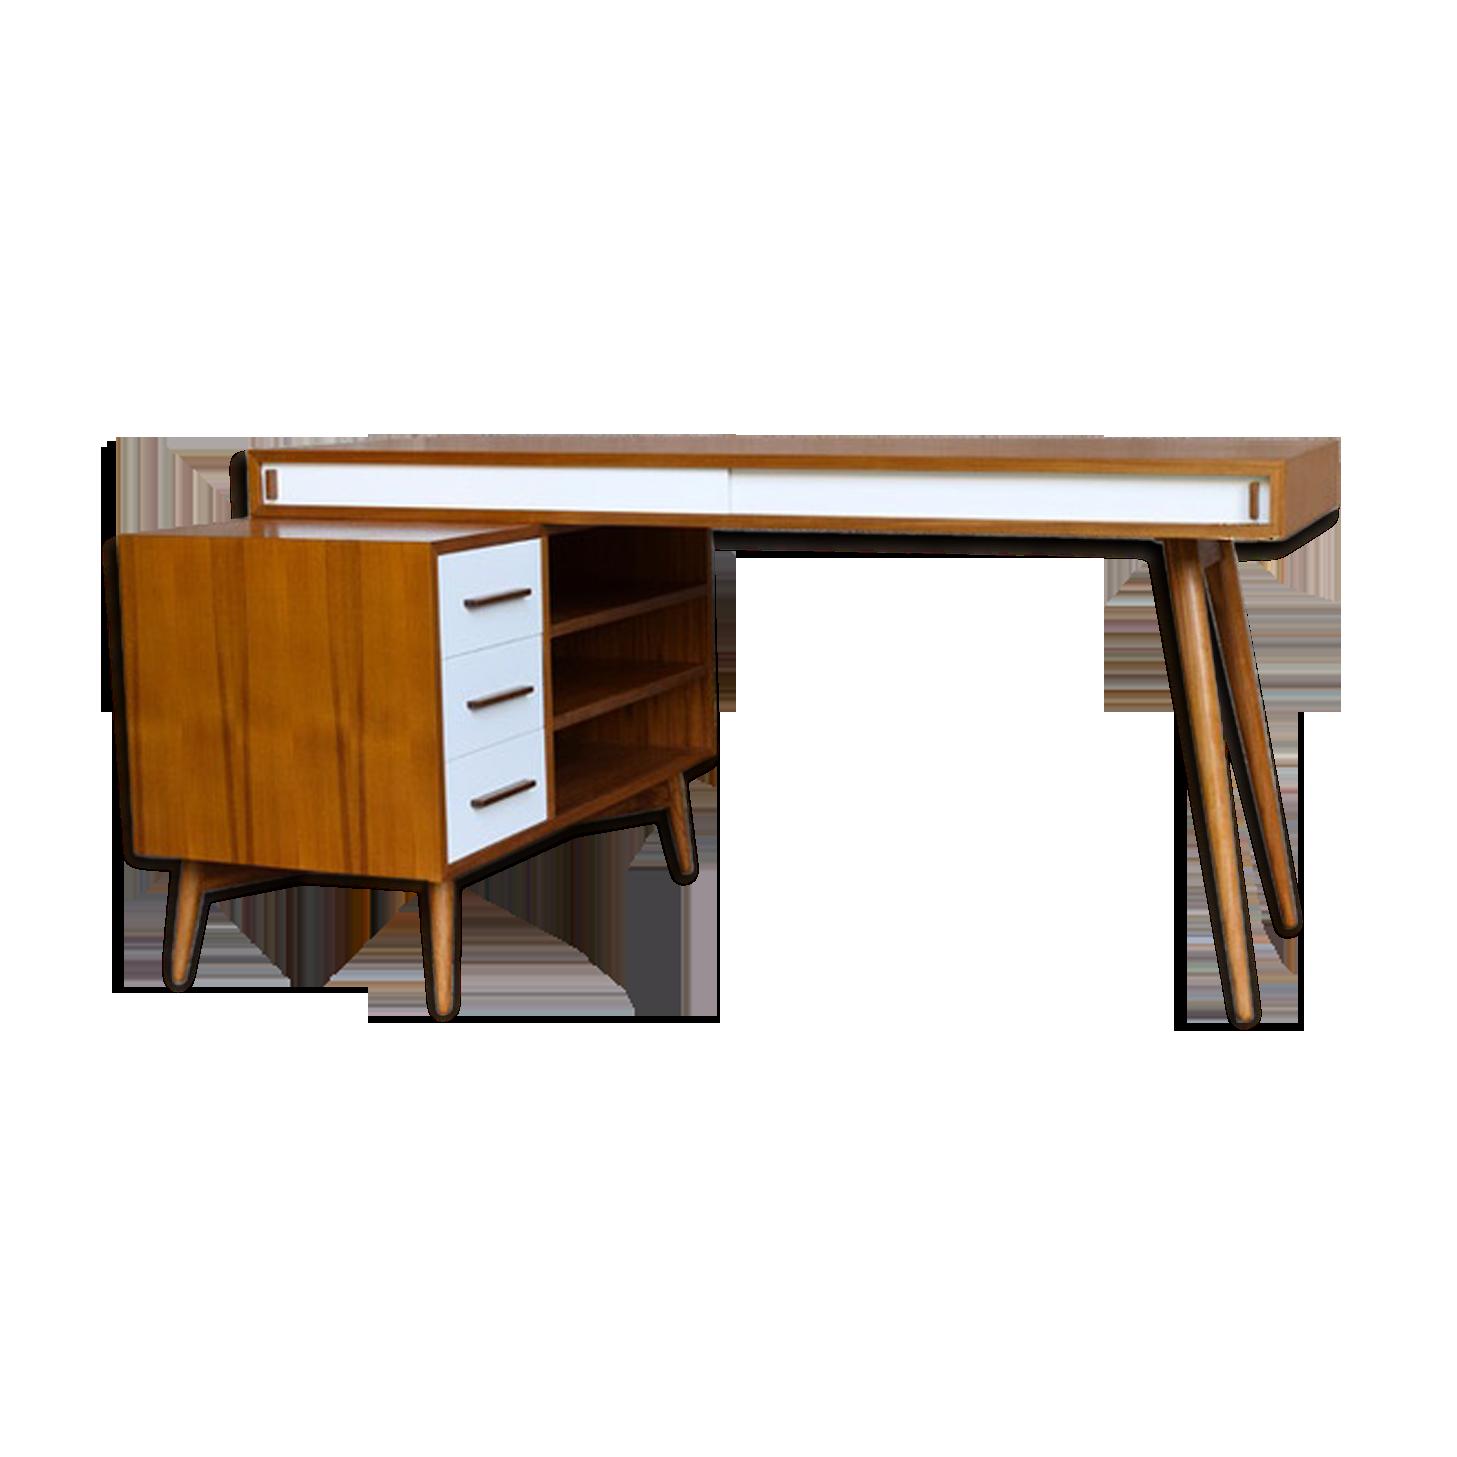 Bureau design scandinave tiroirs en teck massif sydney